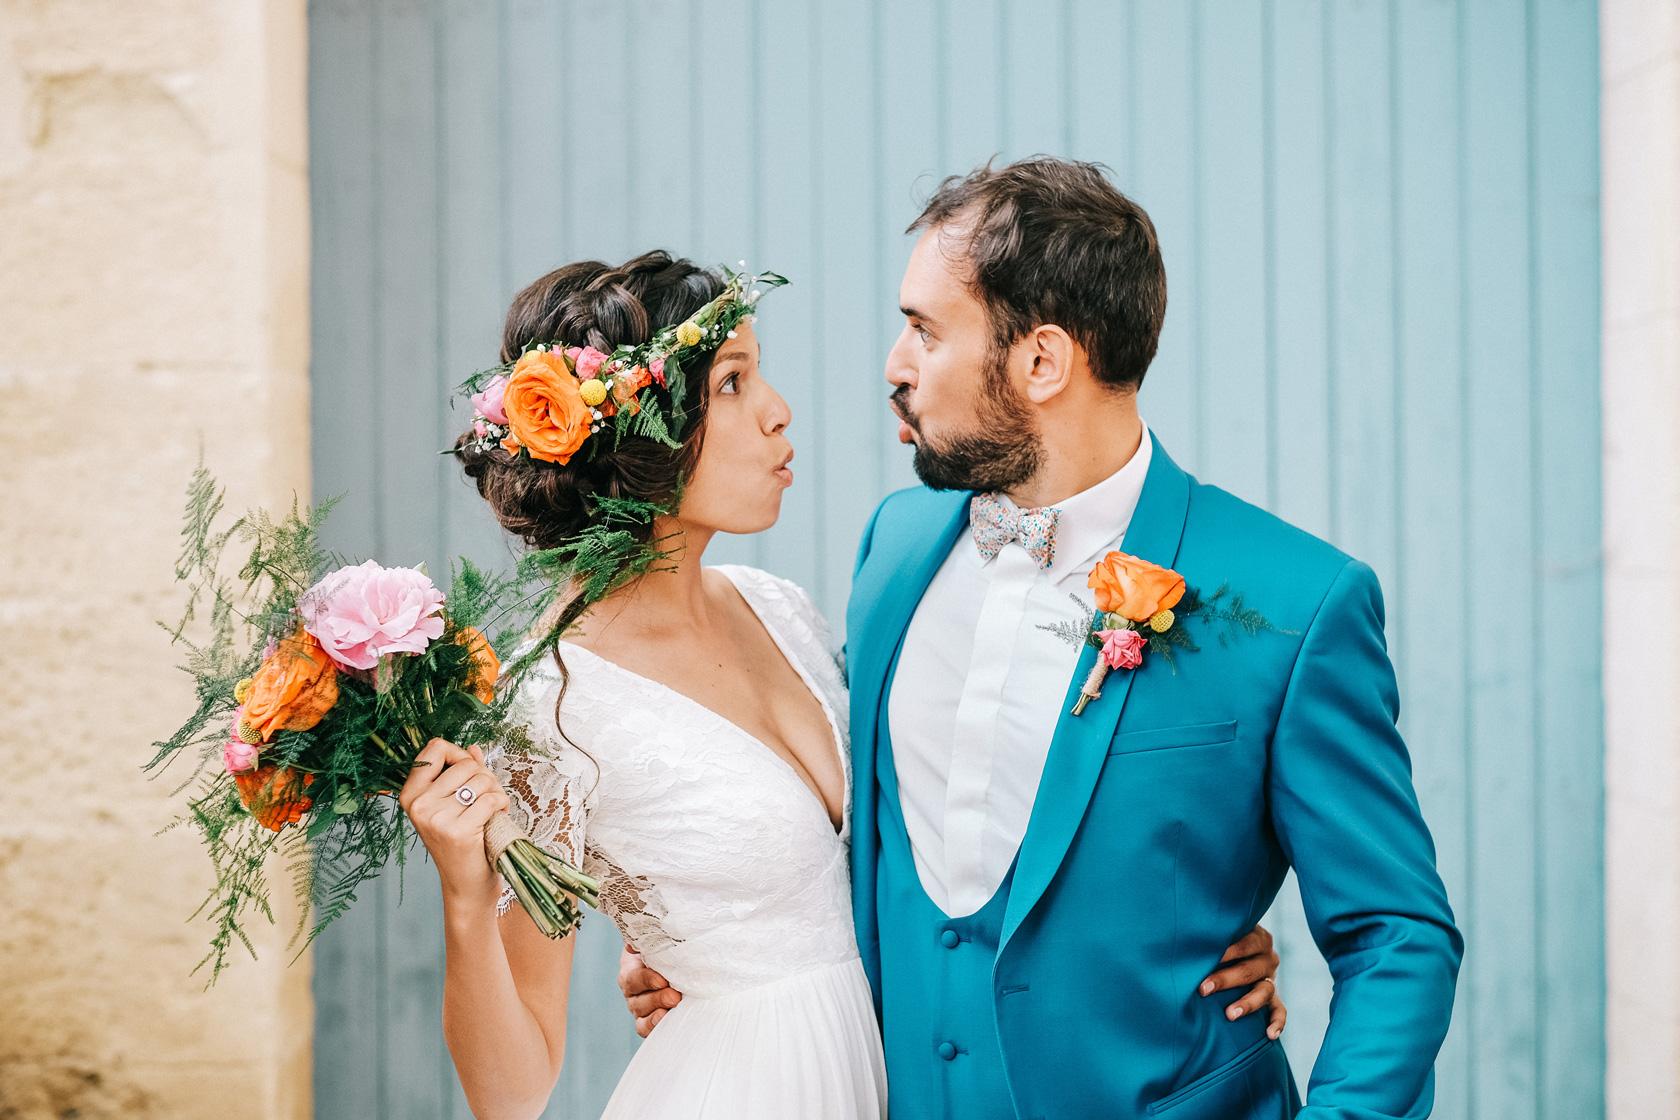 photographe-mariage-au-chateau-sainte-cecile-herault-studio-lm-575.jpg